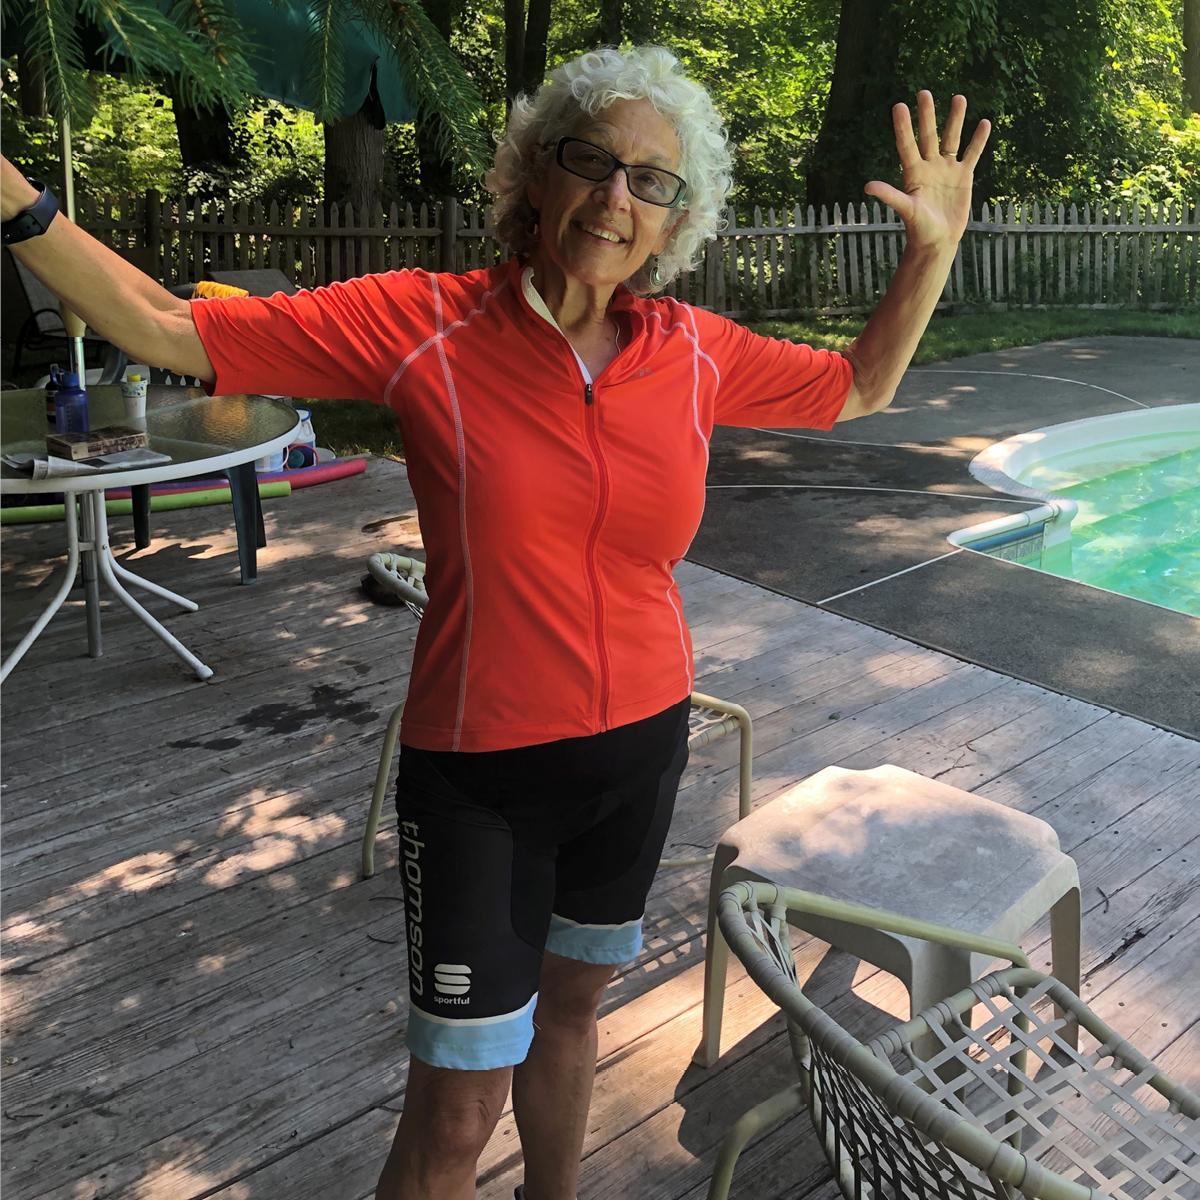 Tour de Shore rider Linda